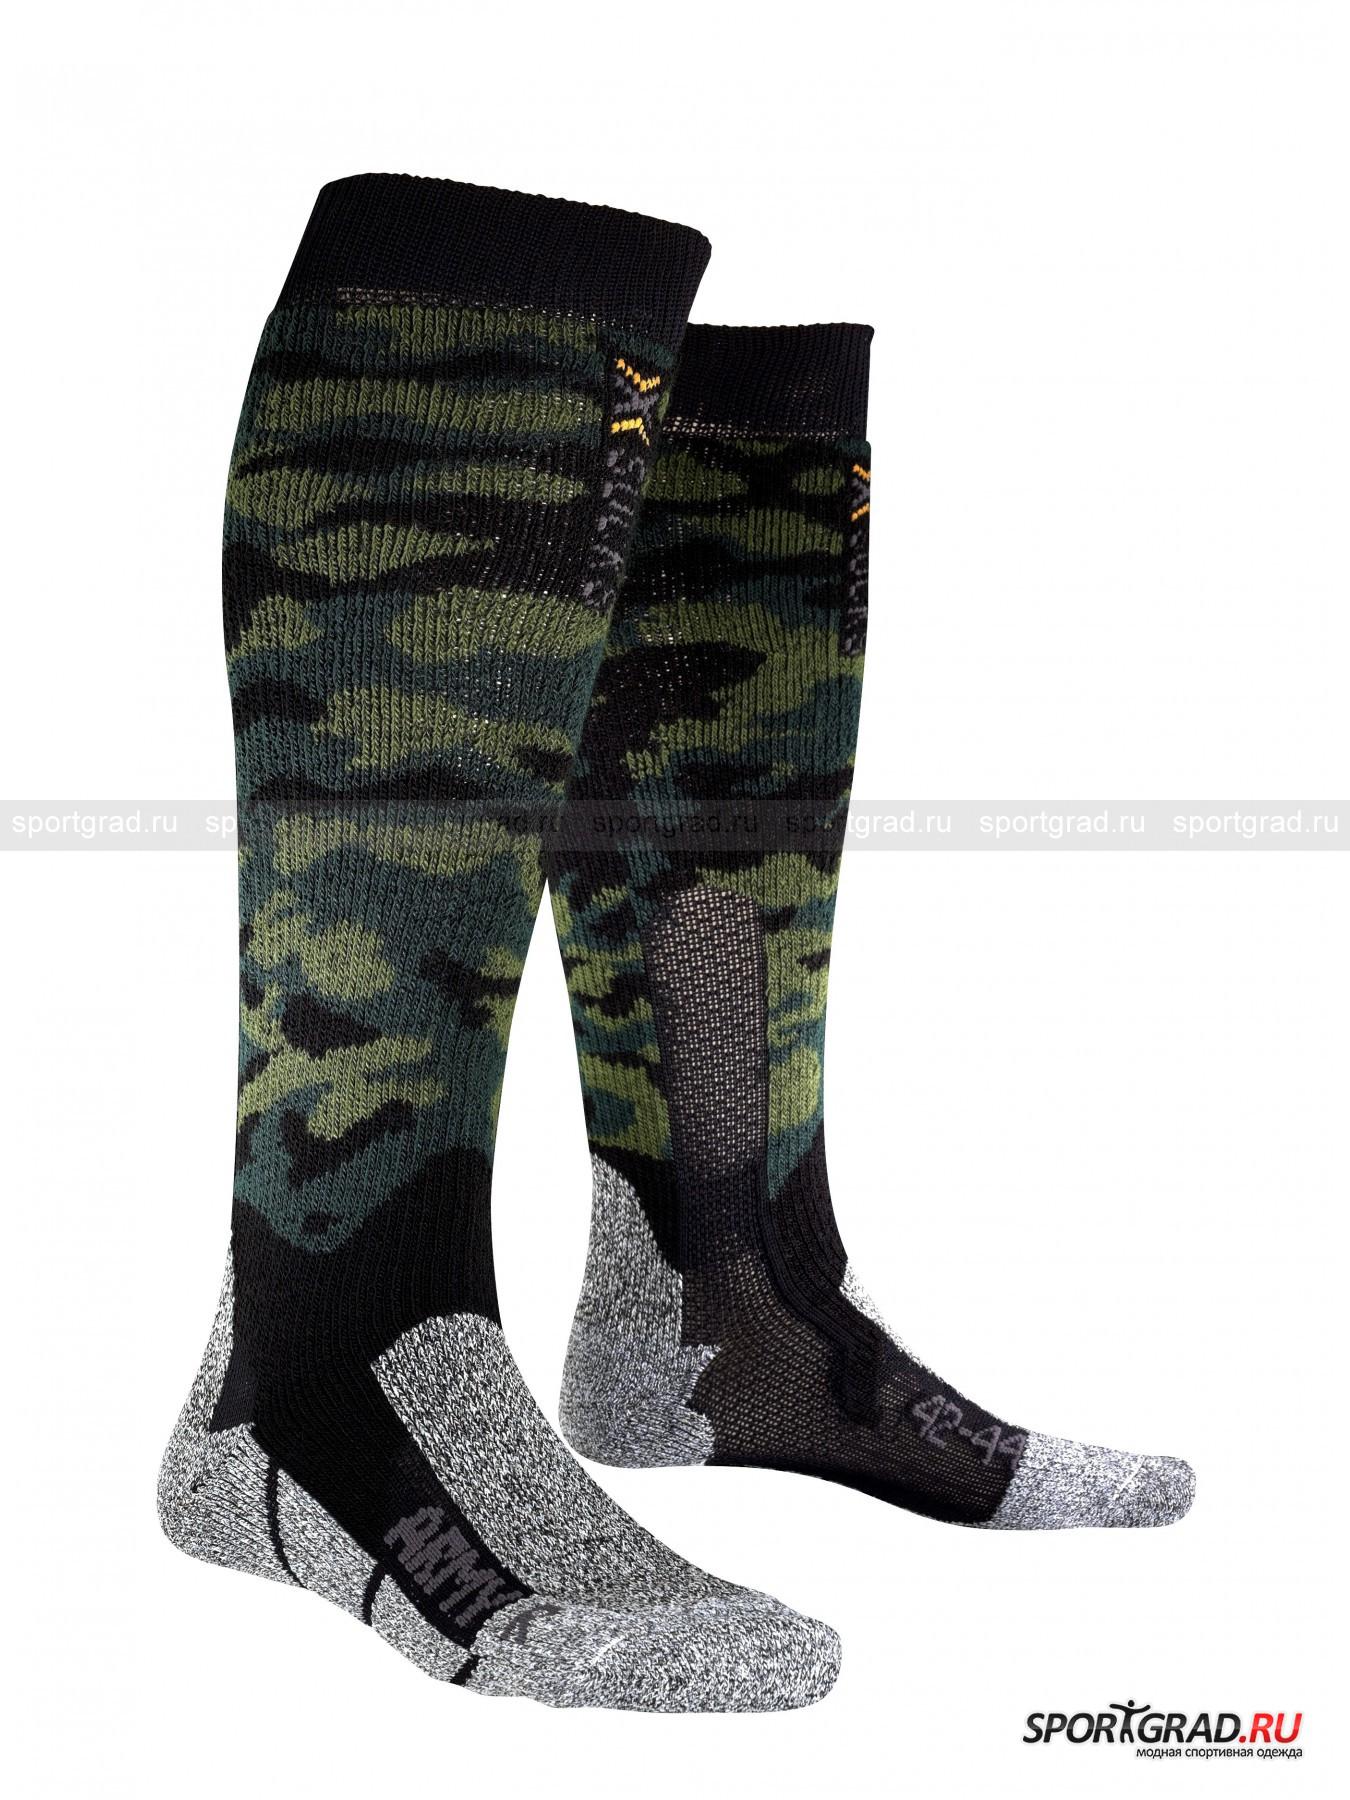 ����� ������� Army Long X-SOCKS